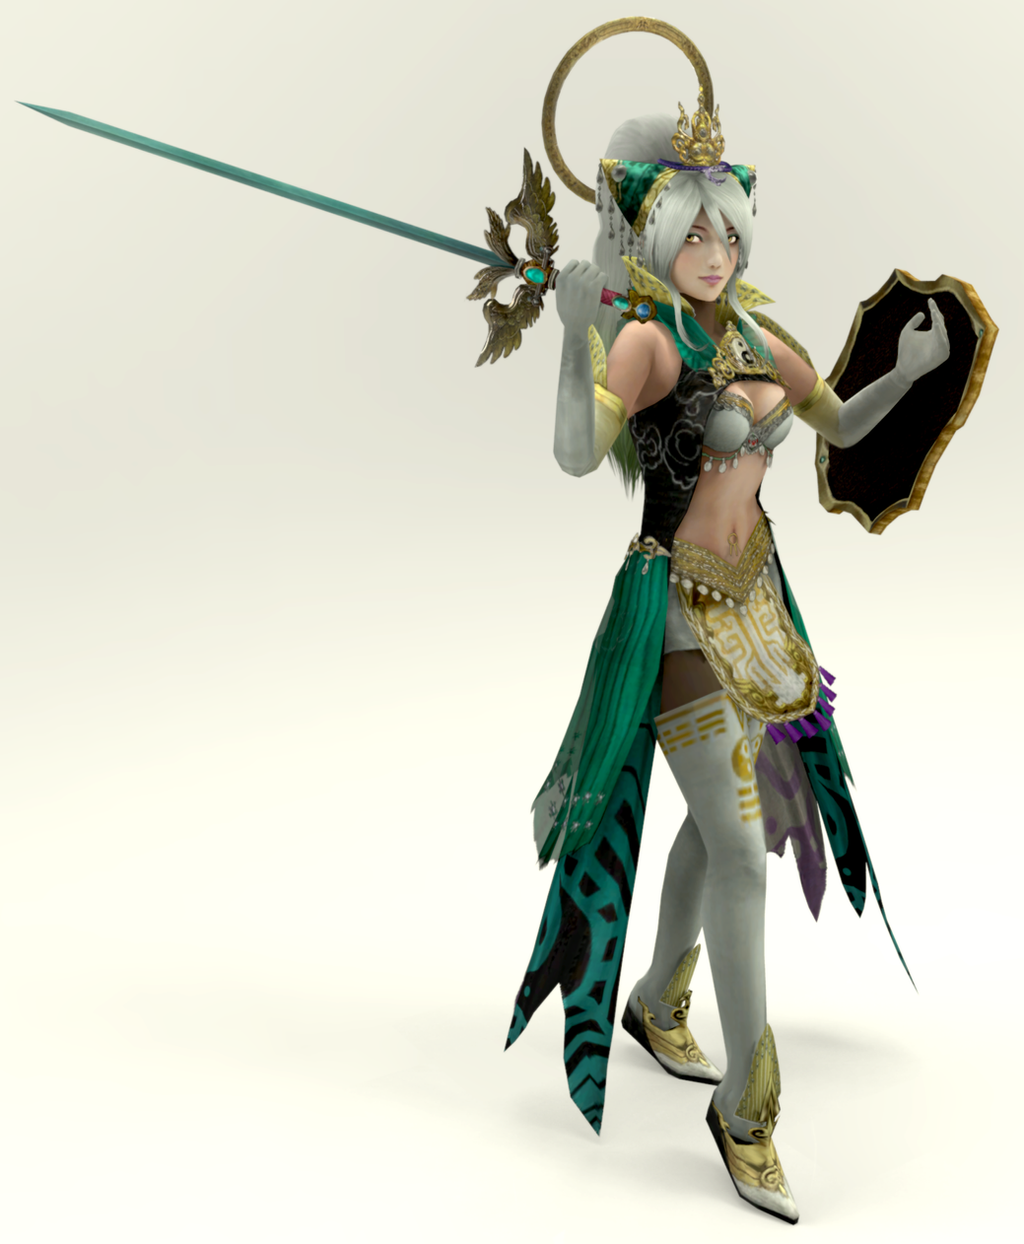 Warriors Orochi 4 Pc Download: Nuwa From Warriors Orochi 3 By Agekei On DeviantART